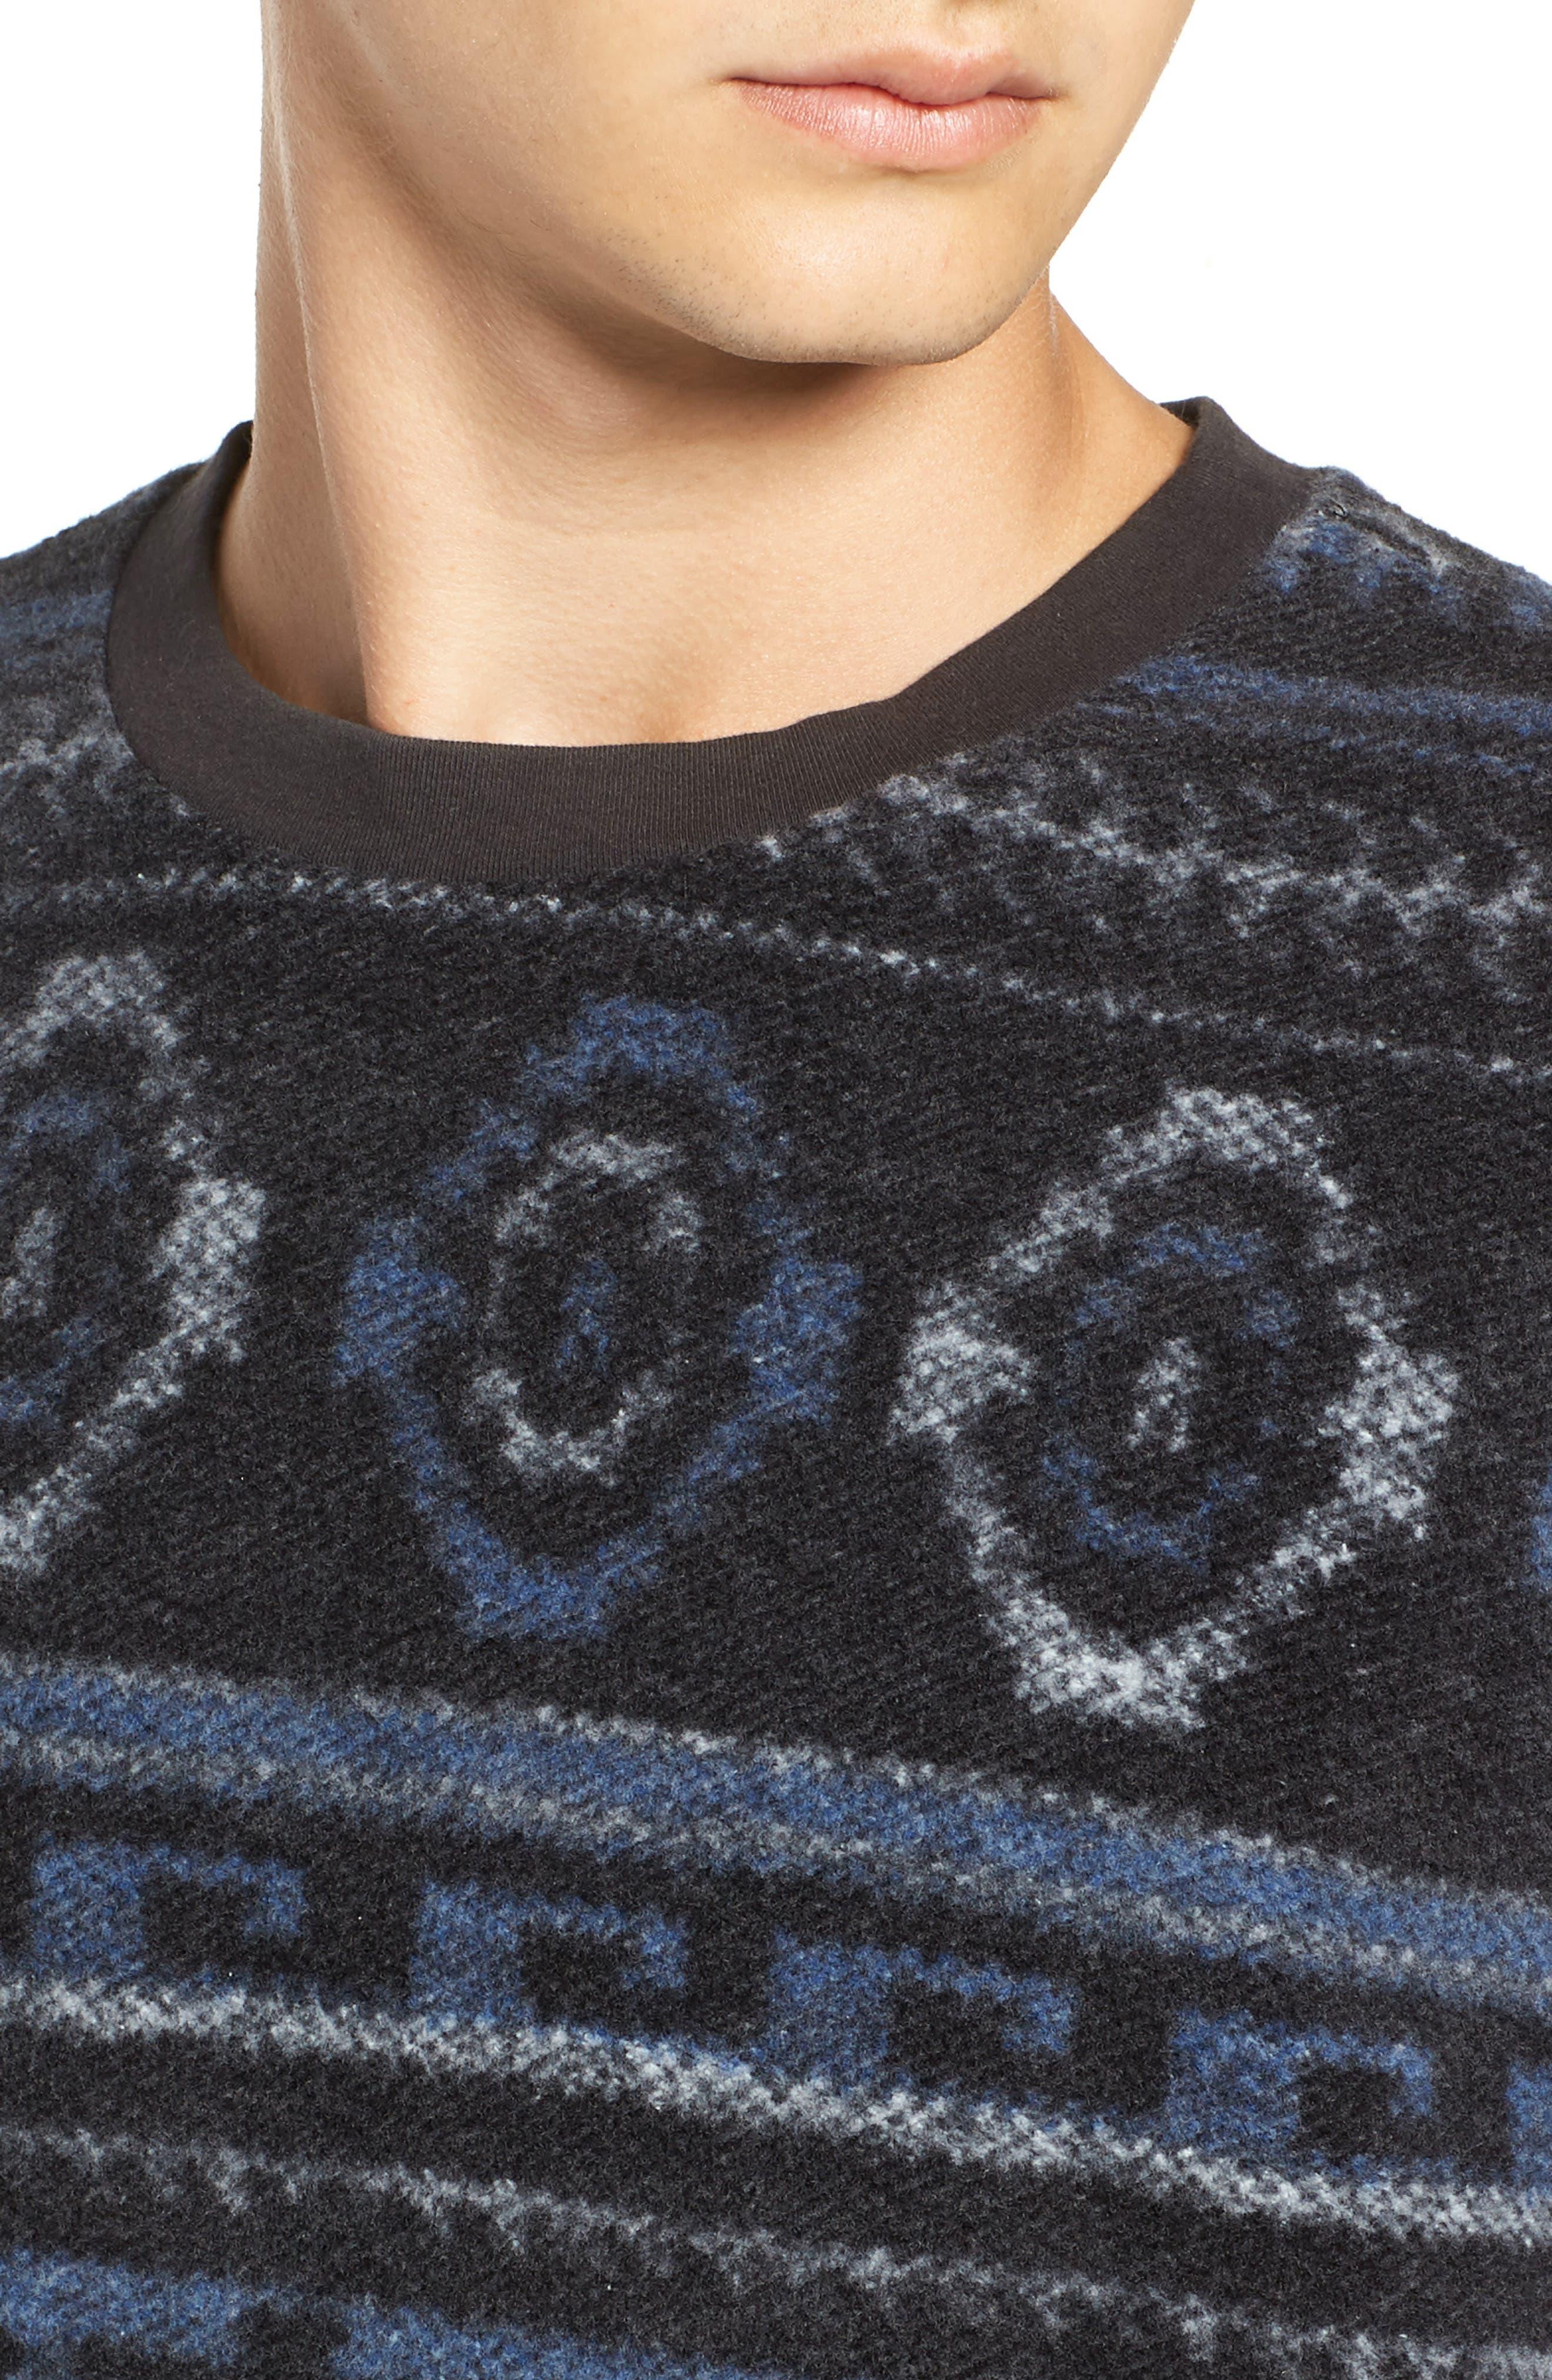 Fleece Sweatshirt,                             Alternate thumbnail 4, color,                             020